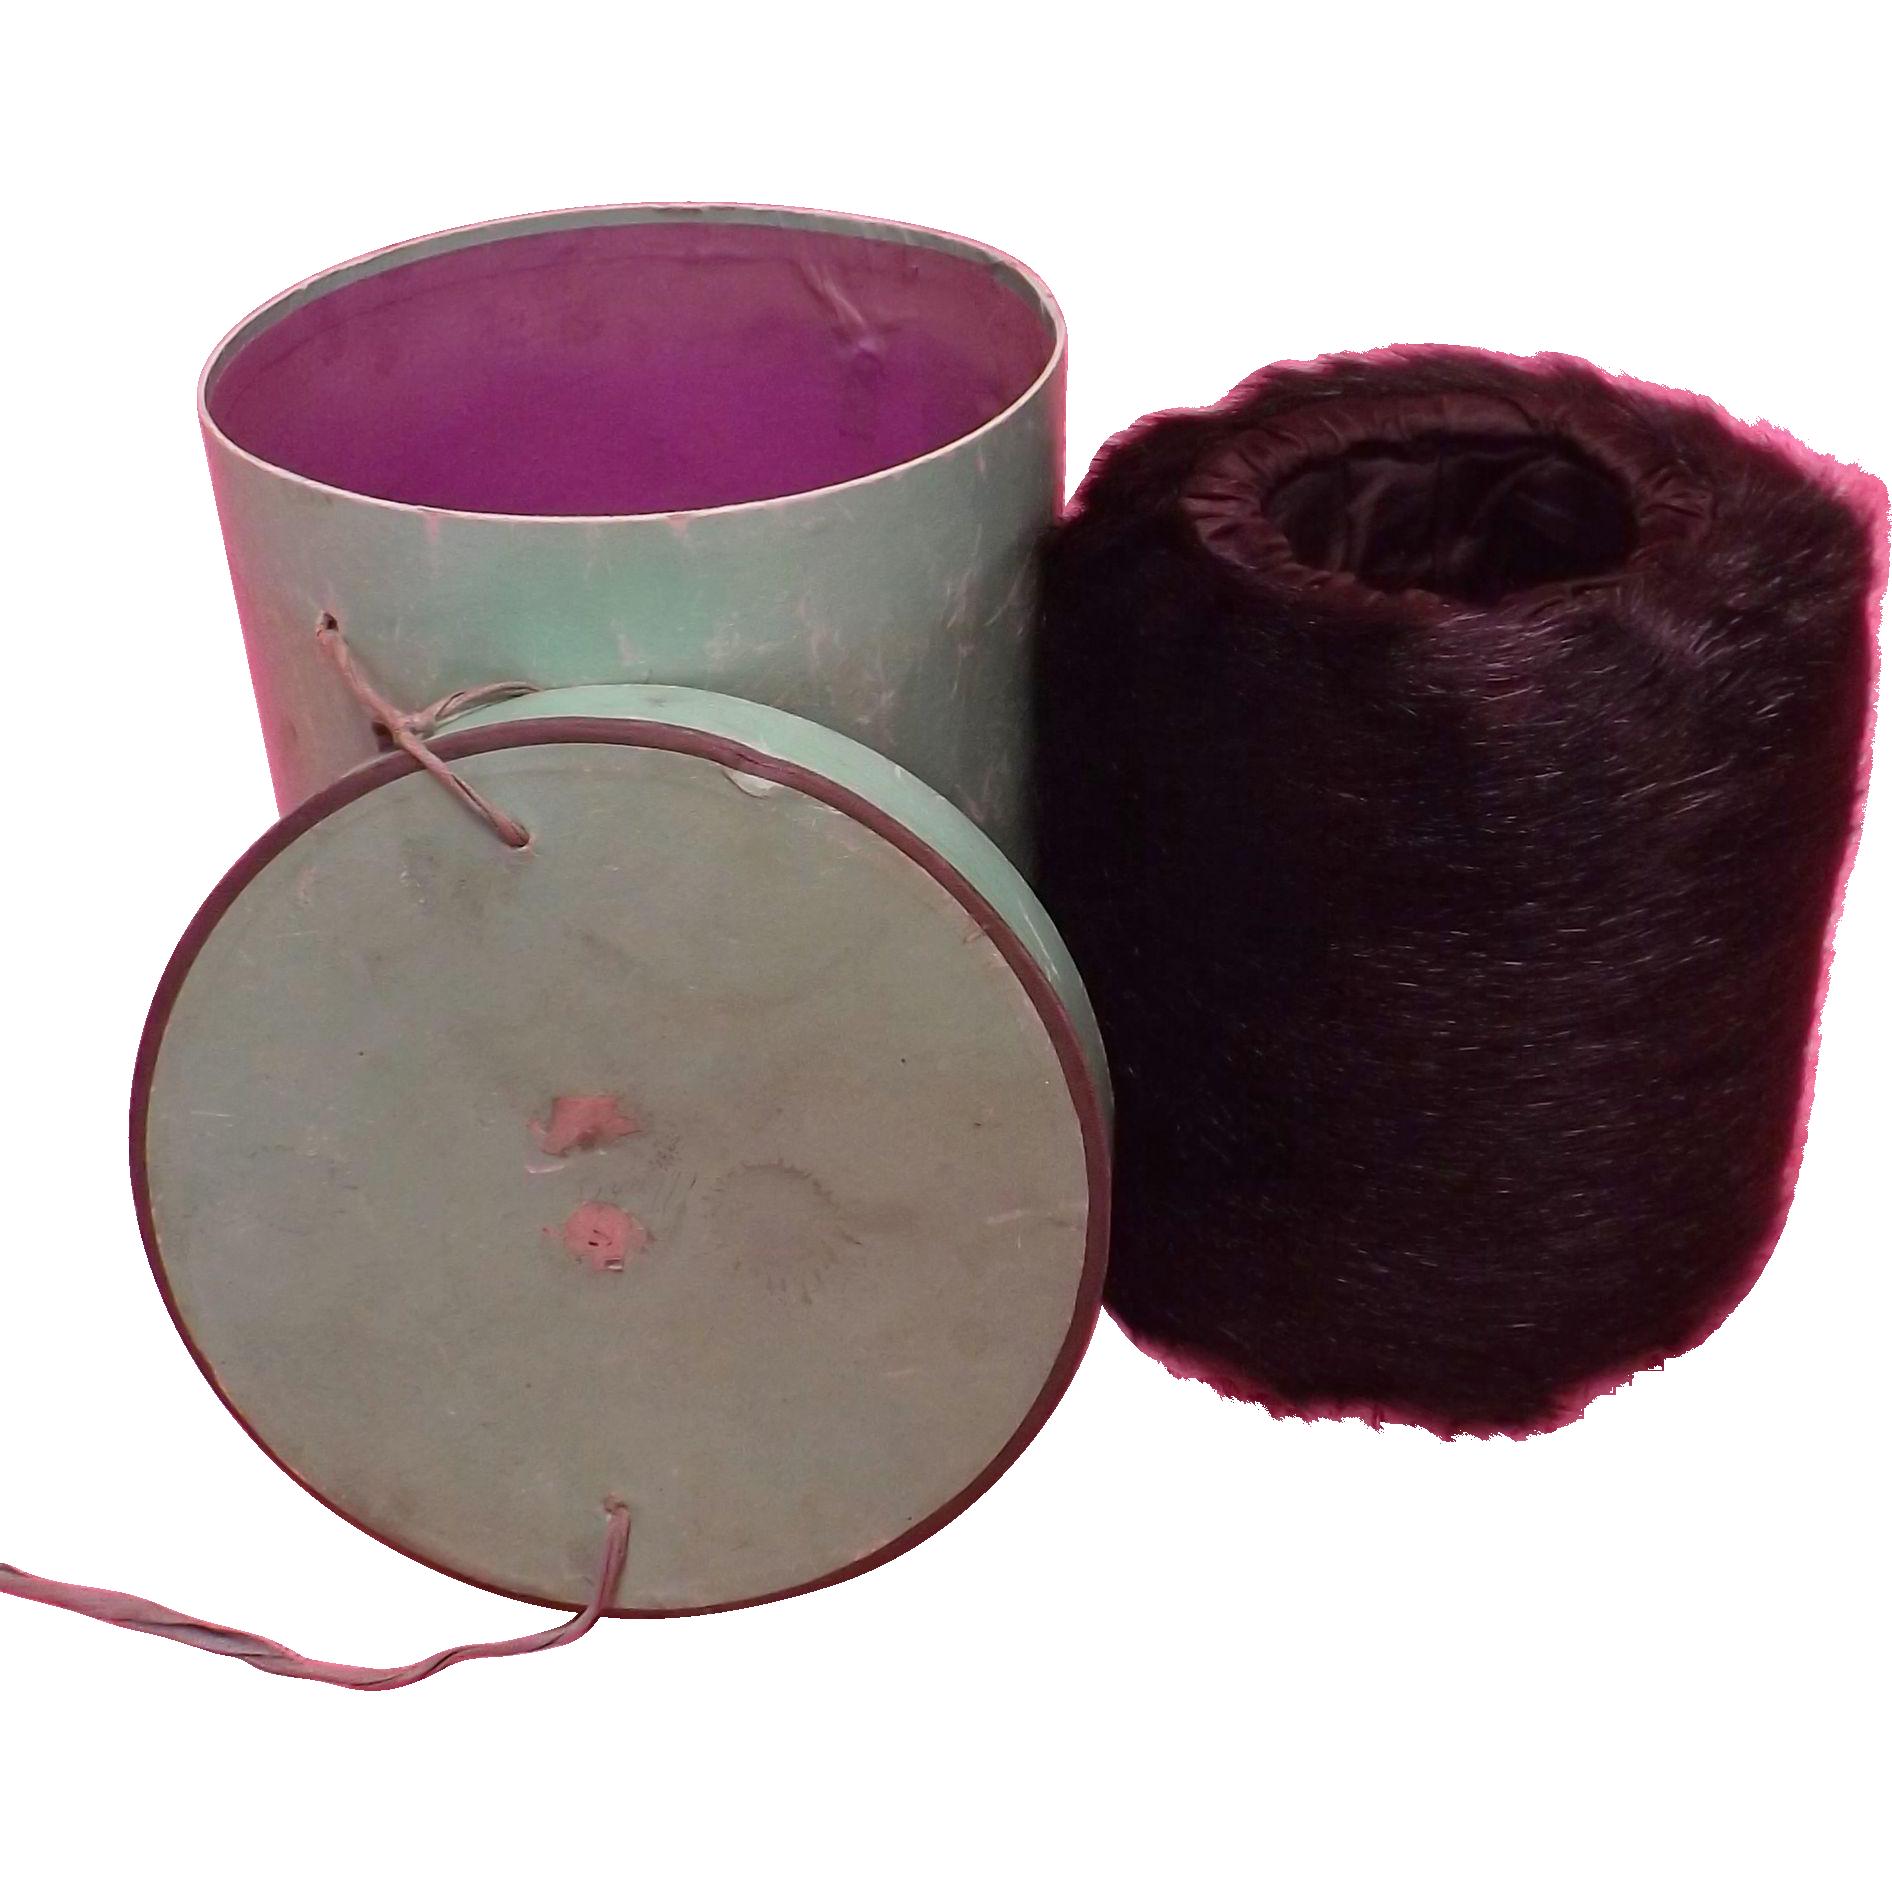 Edwardian English Ladies 'Muff' in Original Cylinder Box